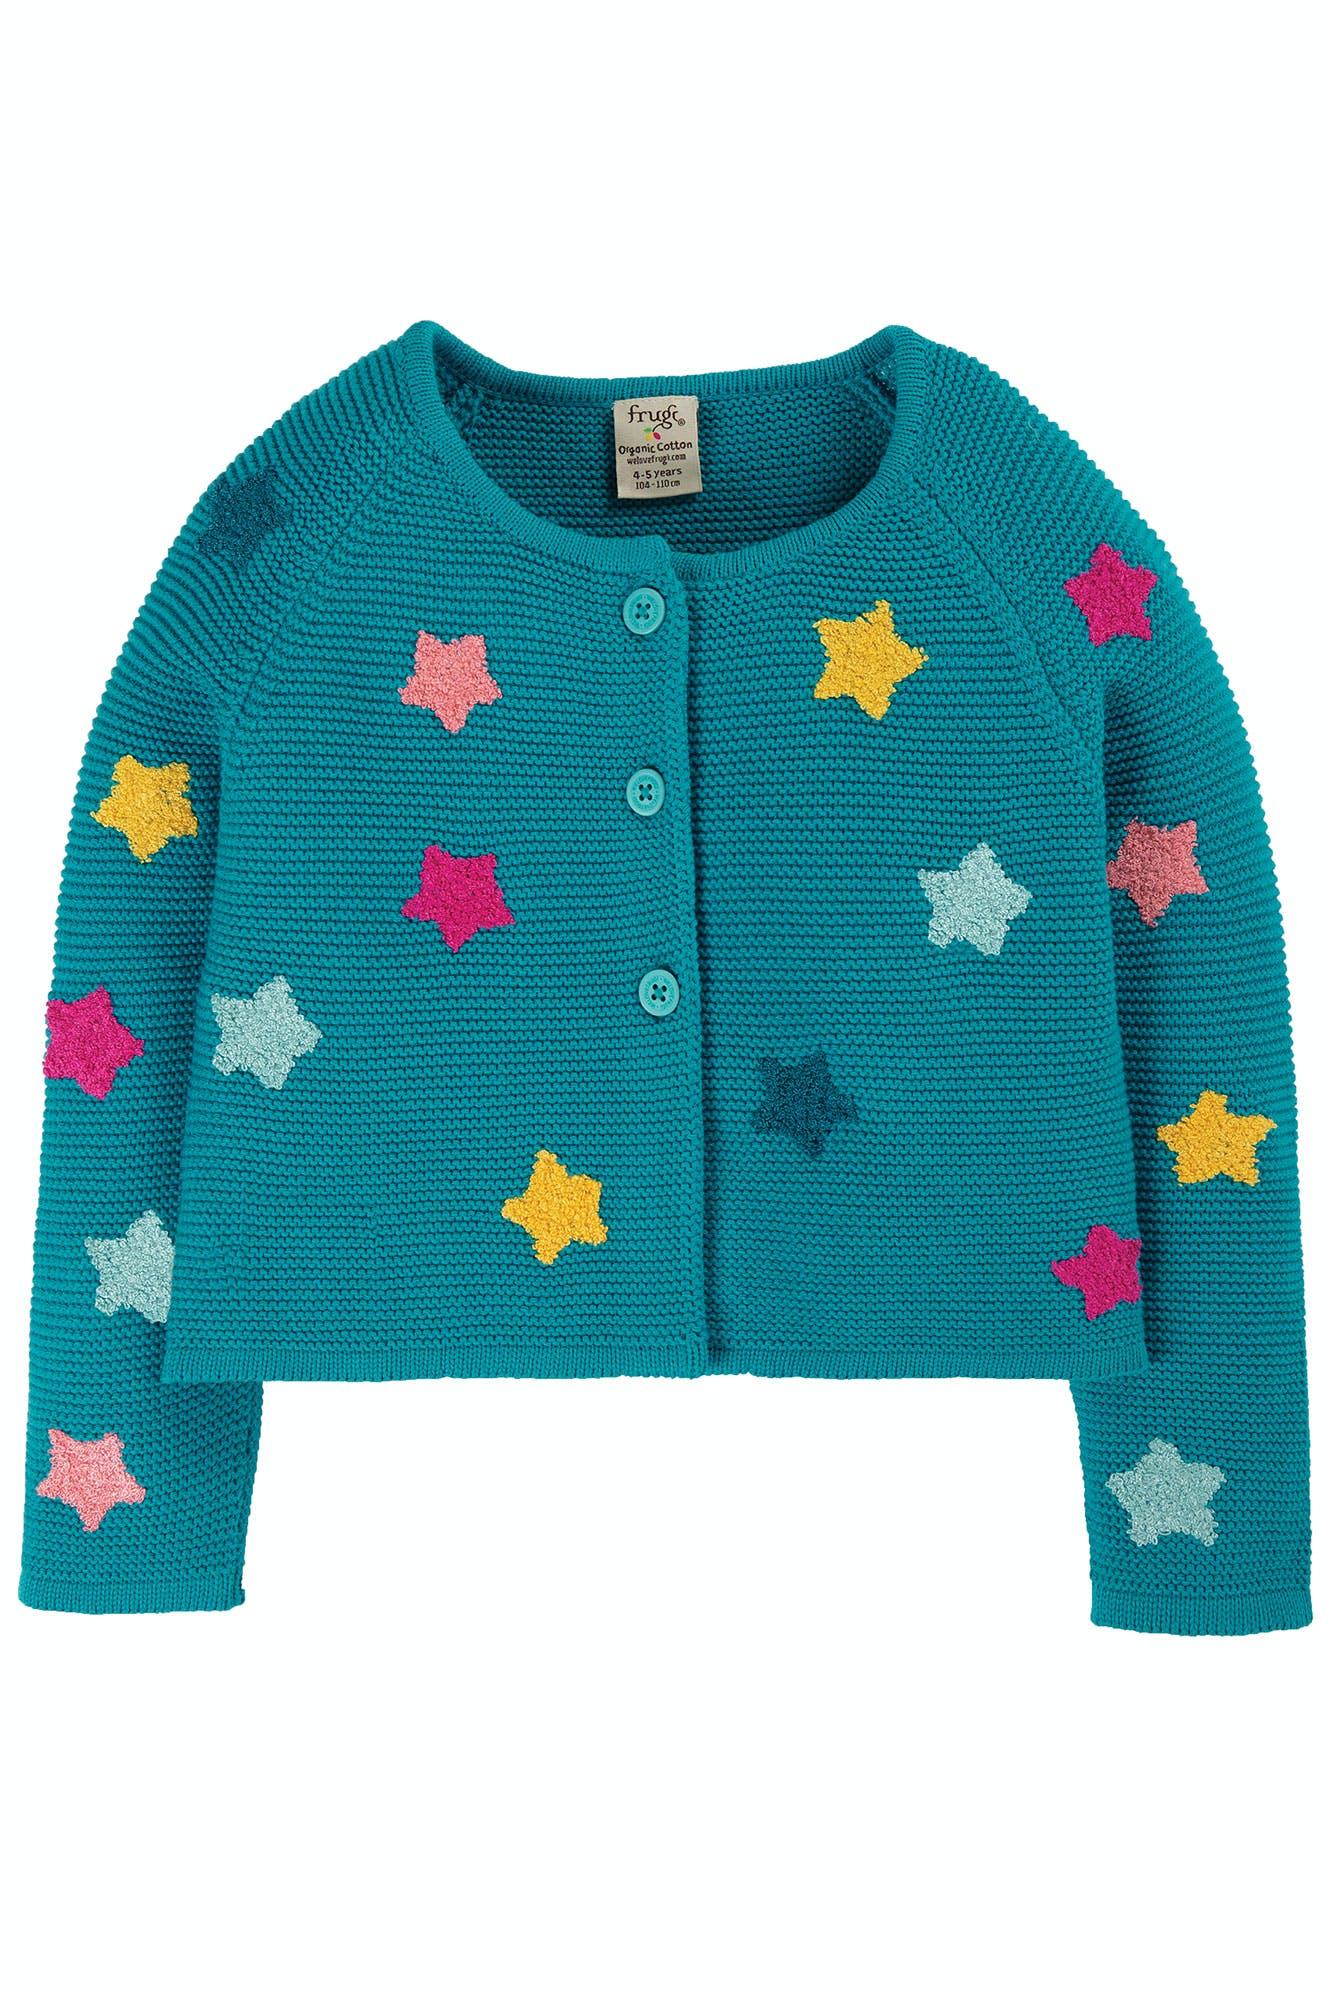 SALE £27.20 Frugi Emilia Embroidered Cardigan-Stars (Was £34)